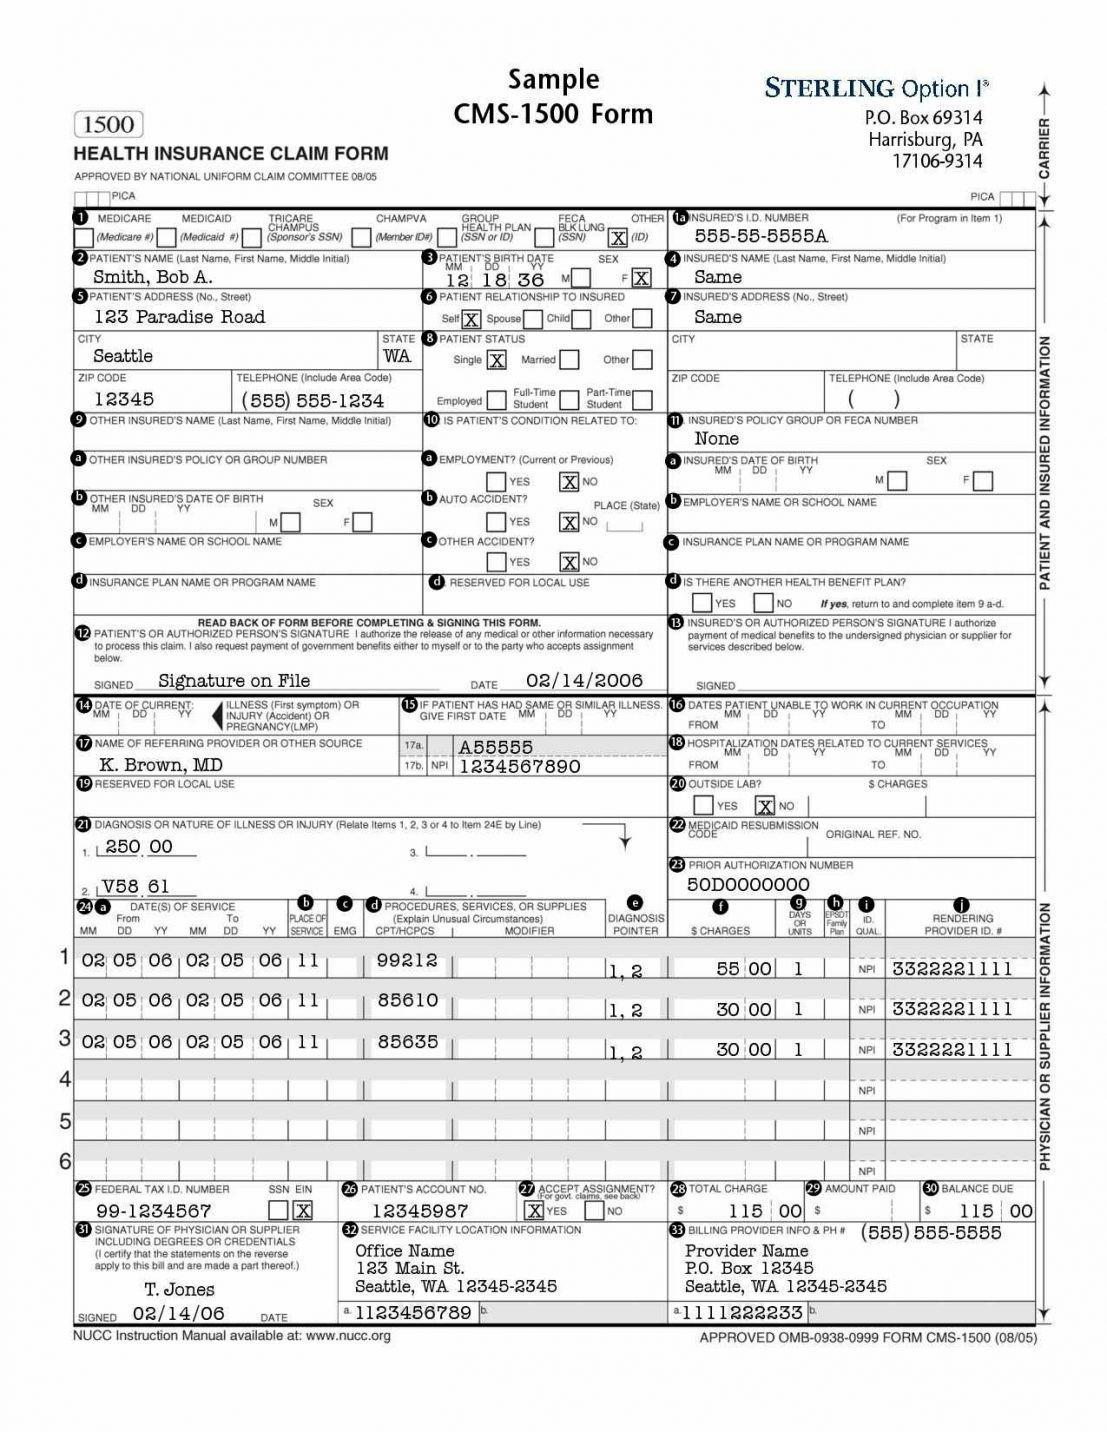 Free Cms 1500 Claim Form Template